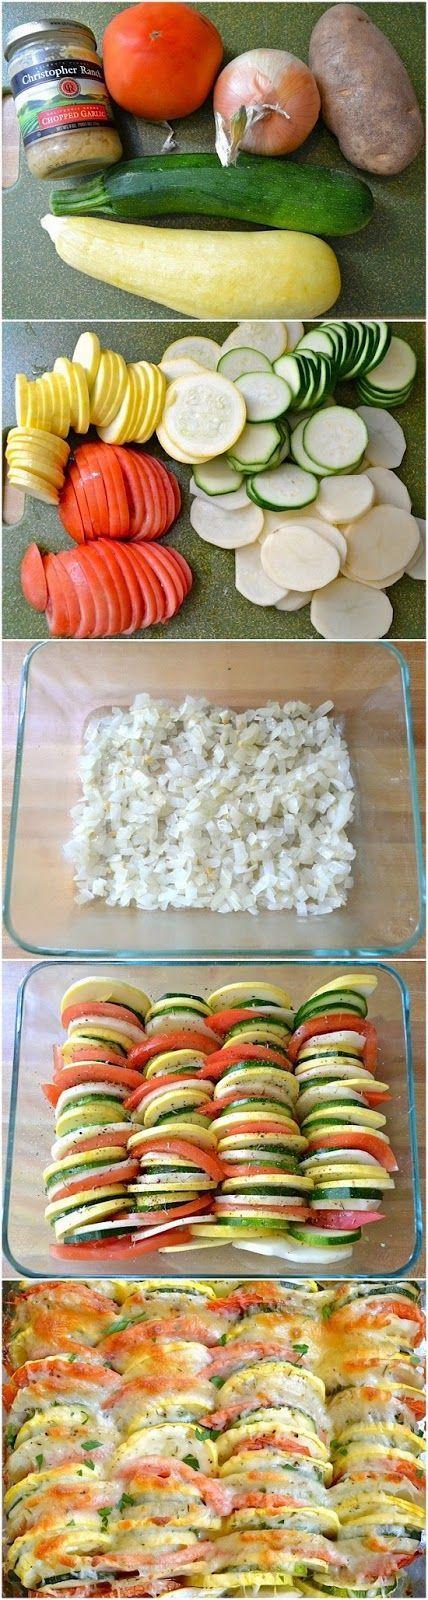 How To Make Summer Vegetable Tian   Food Blog